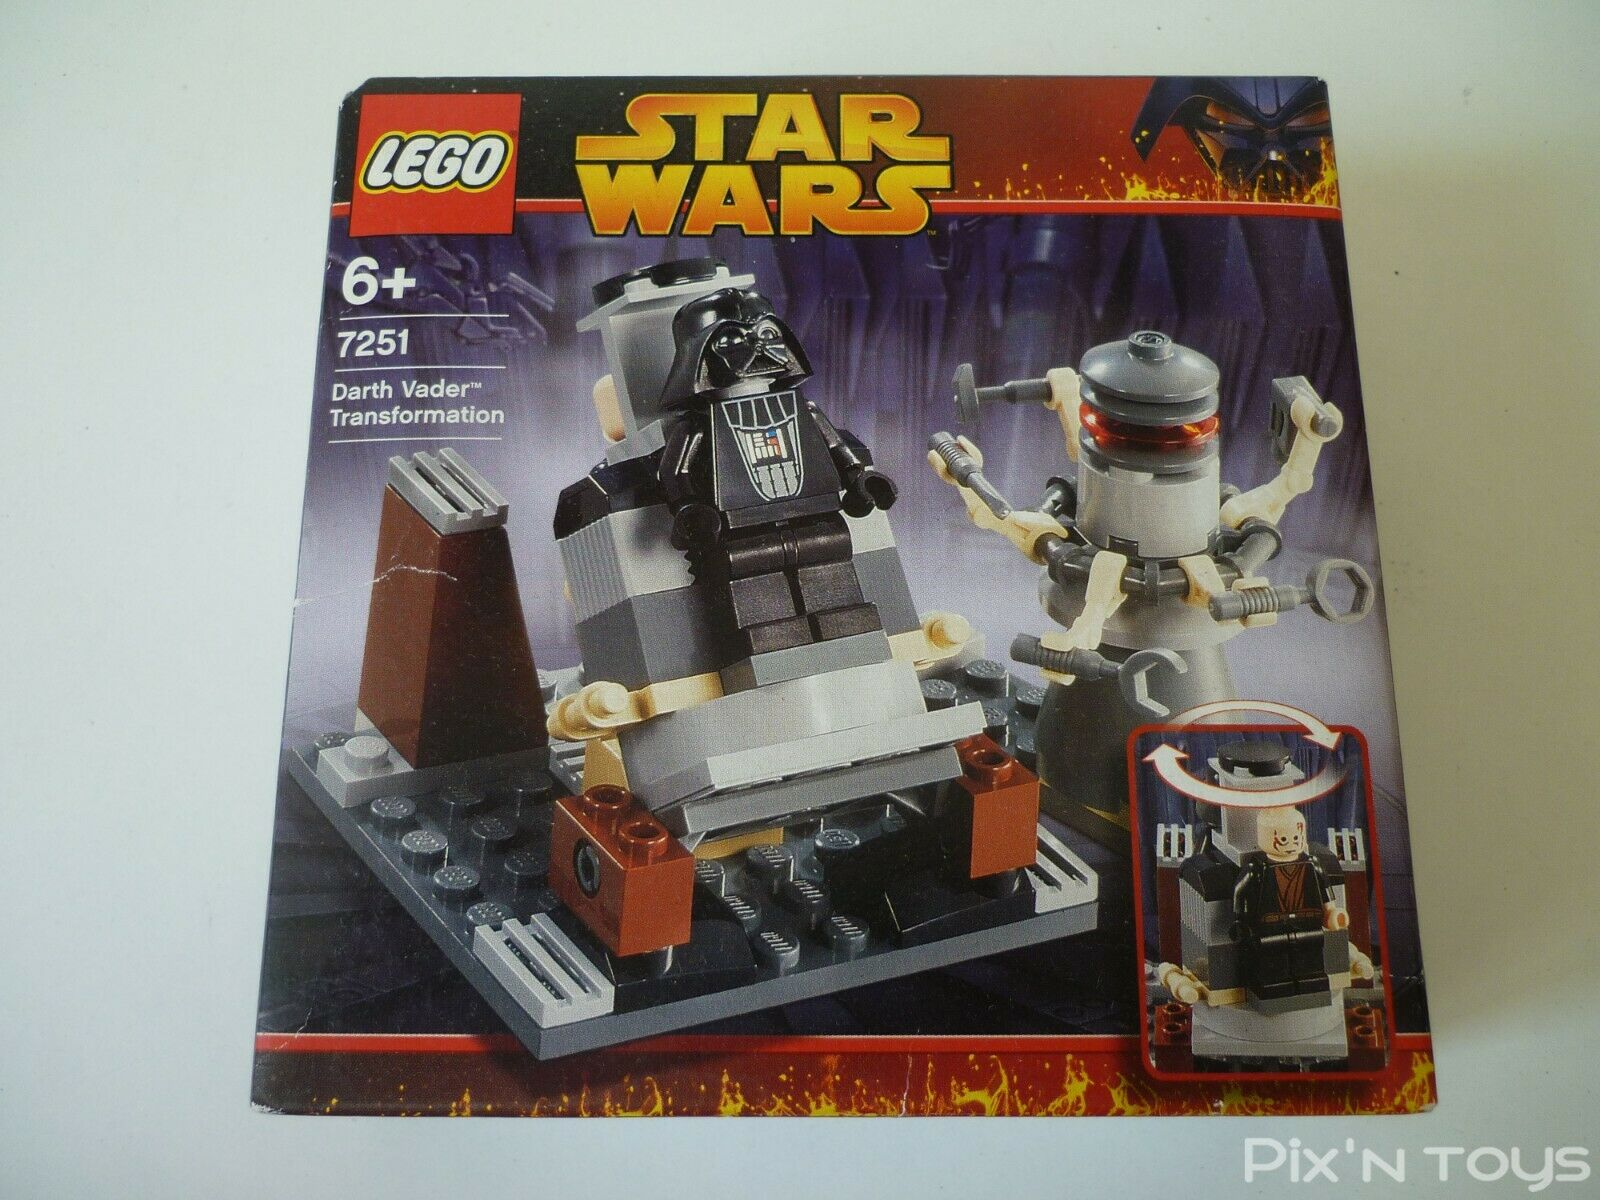 Lego Star Wars 7251 Darth  Vader Transformation  les magasins de détail